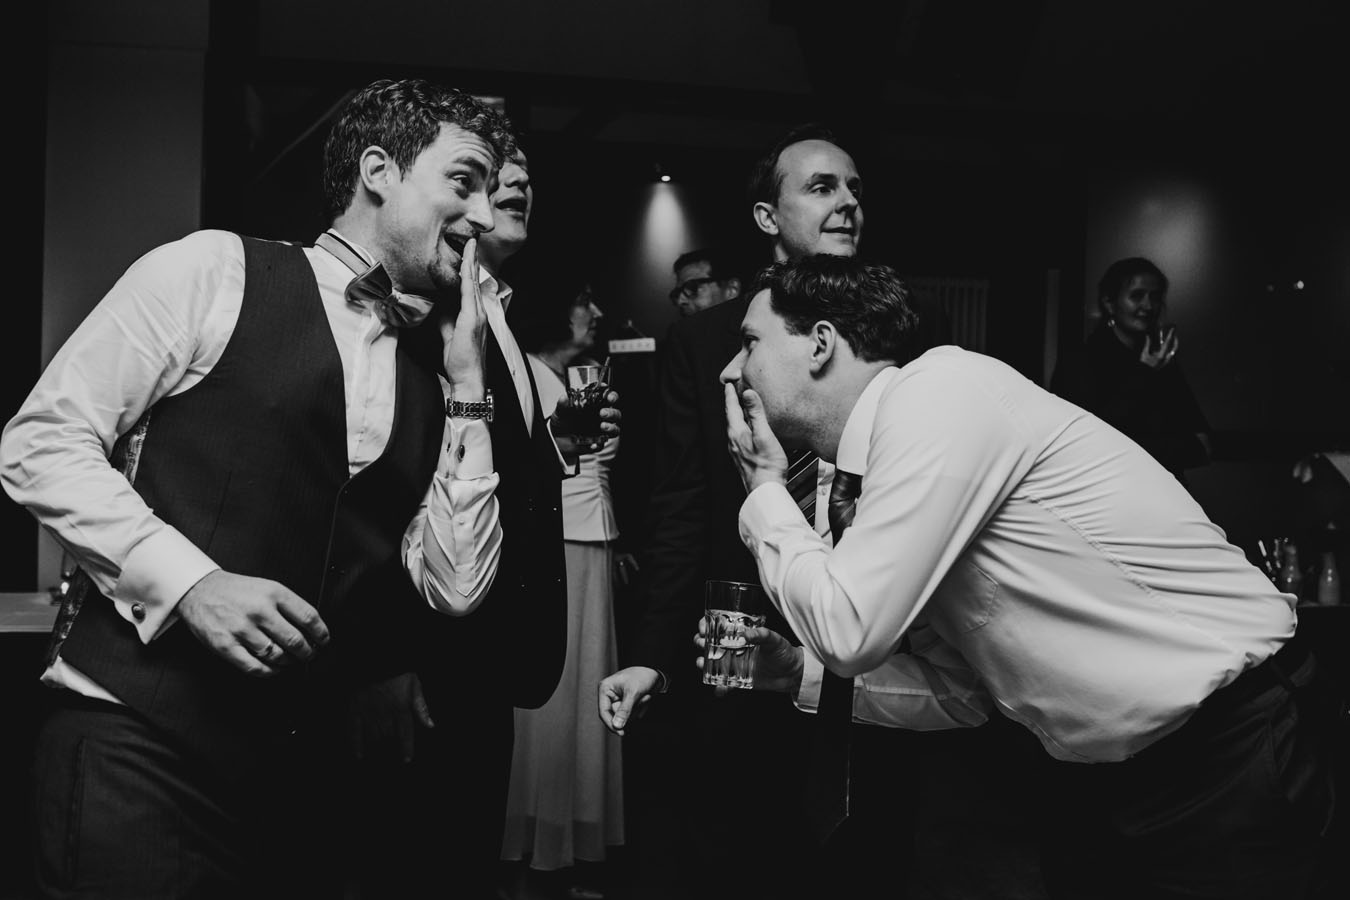 Wedding_234843